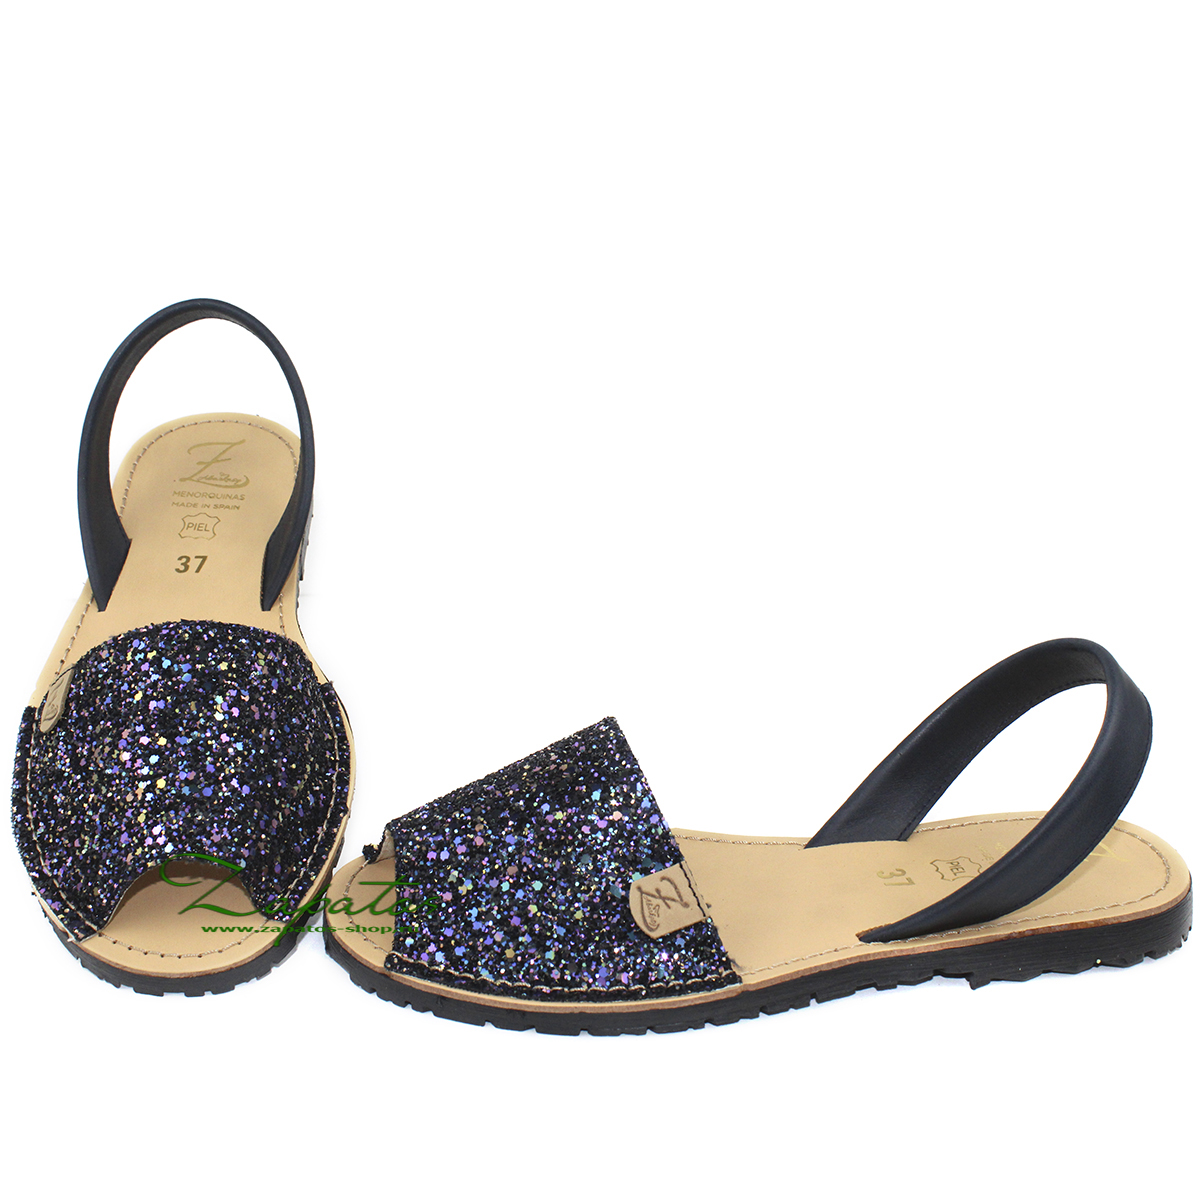 AB. Zapatos 320-5 GLITTER MARINO — АКЦИЯ